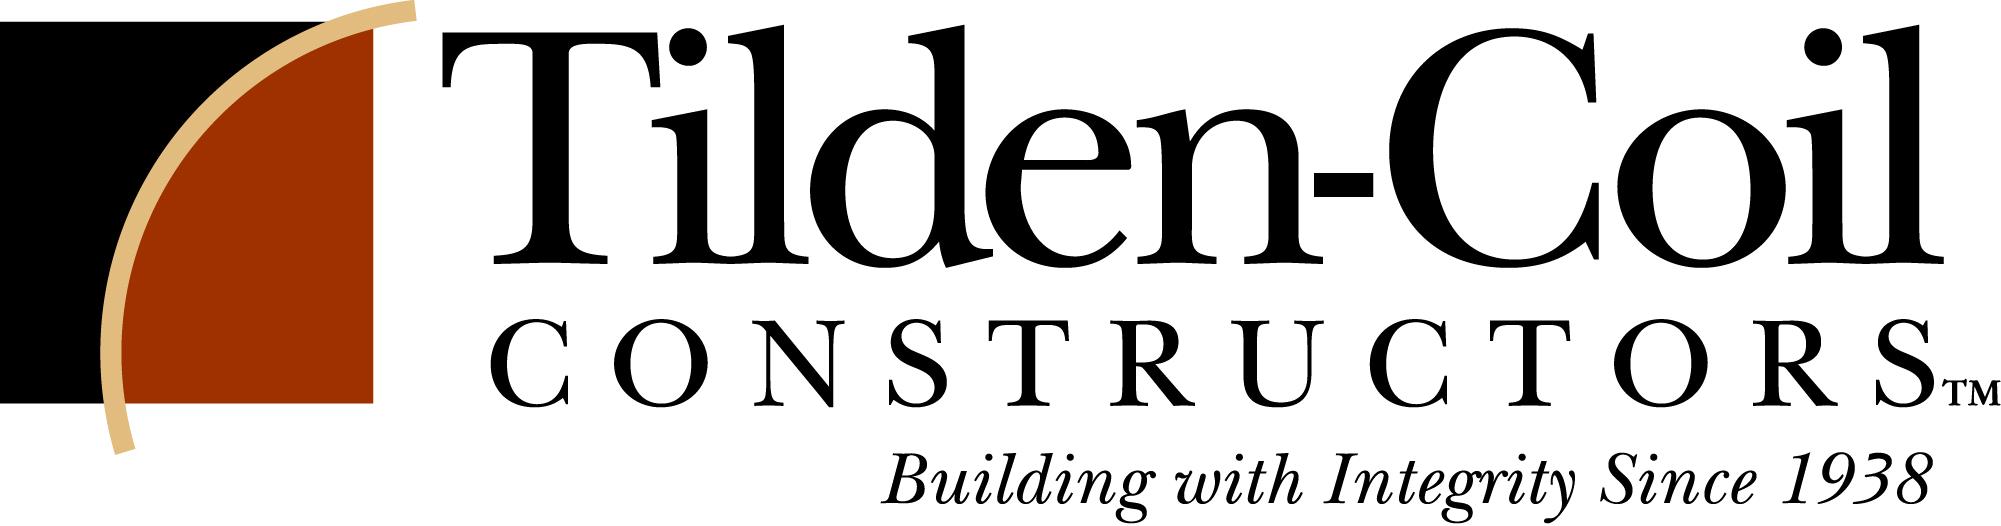 Tilden Coil Constructors